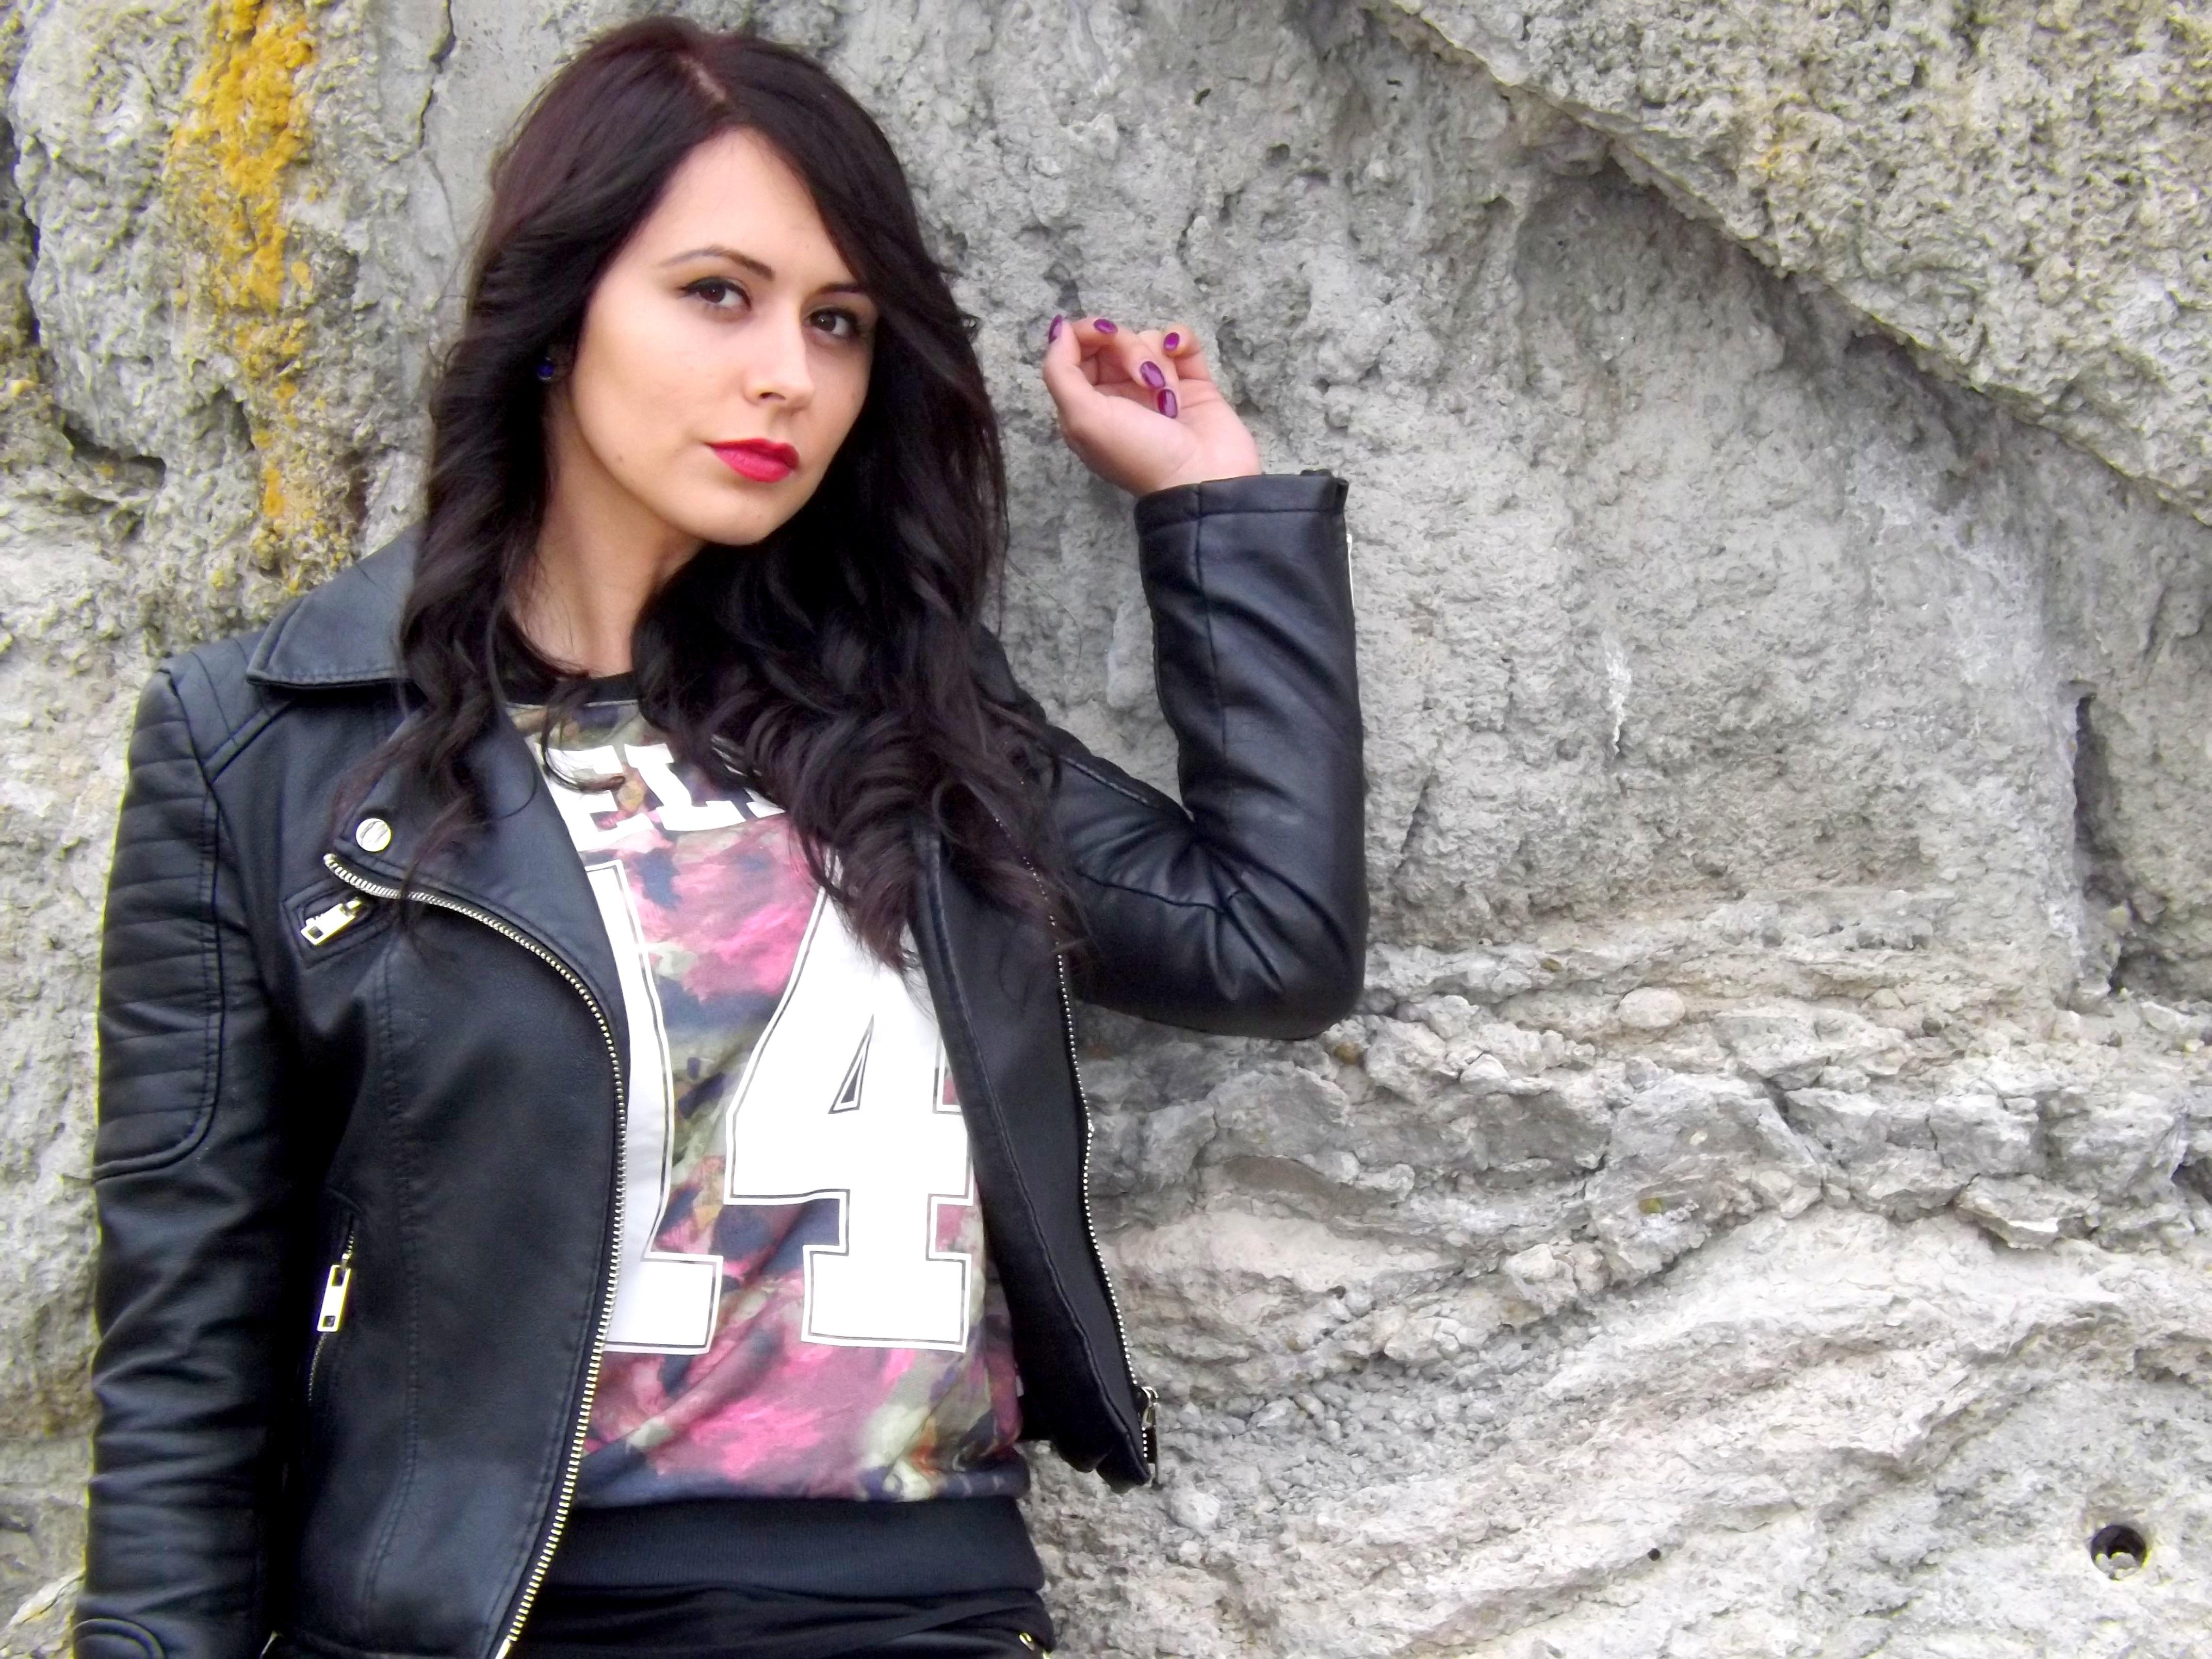 30a928274f rock niña cuero pierna pelaje morena modelo primavera Moda ropa negro dama  chaqueta ropa de calle